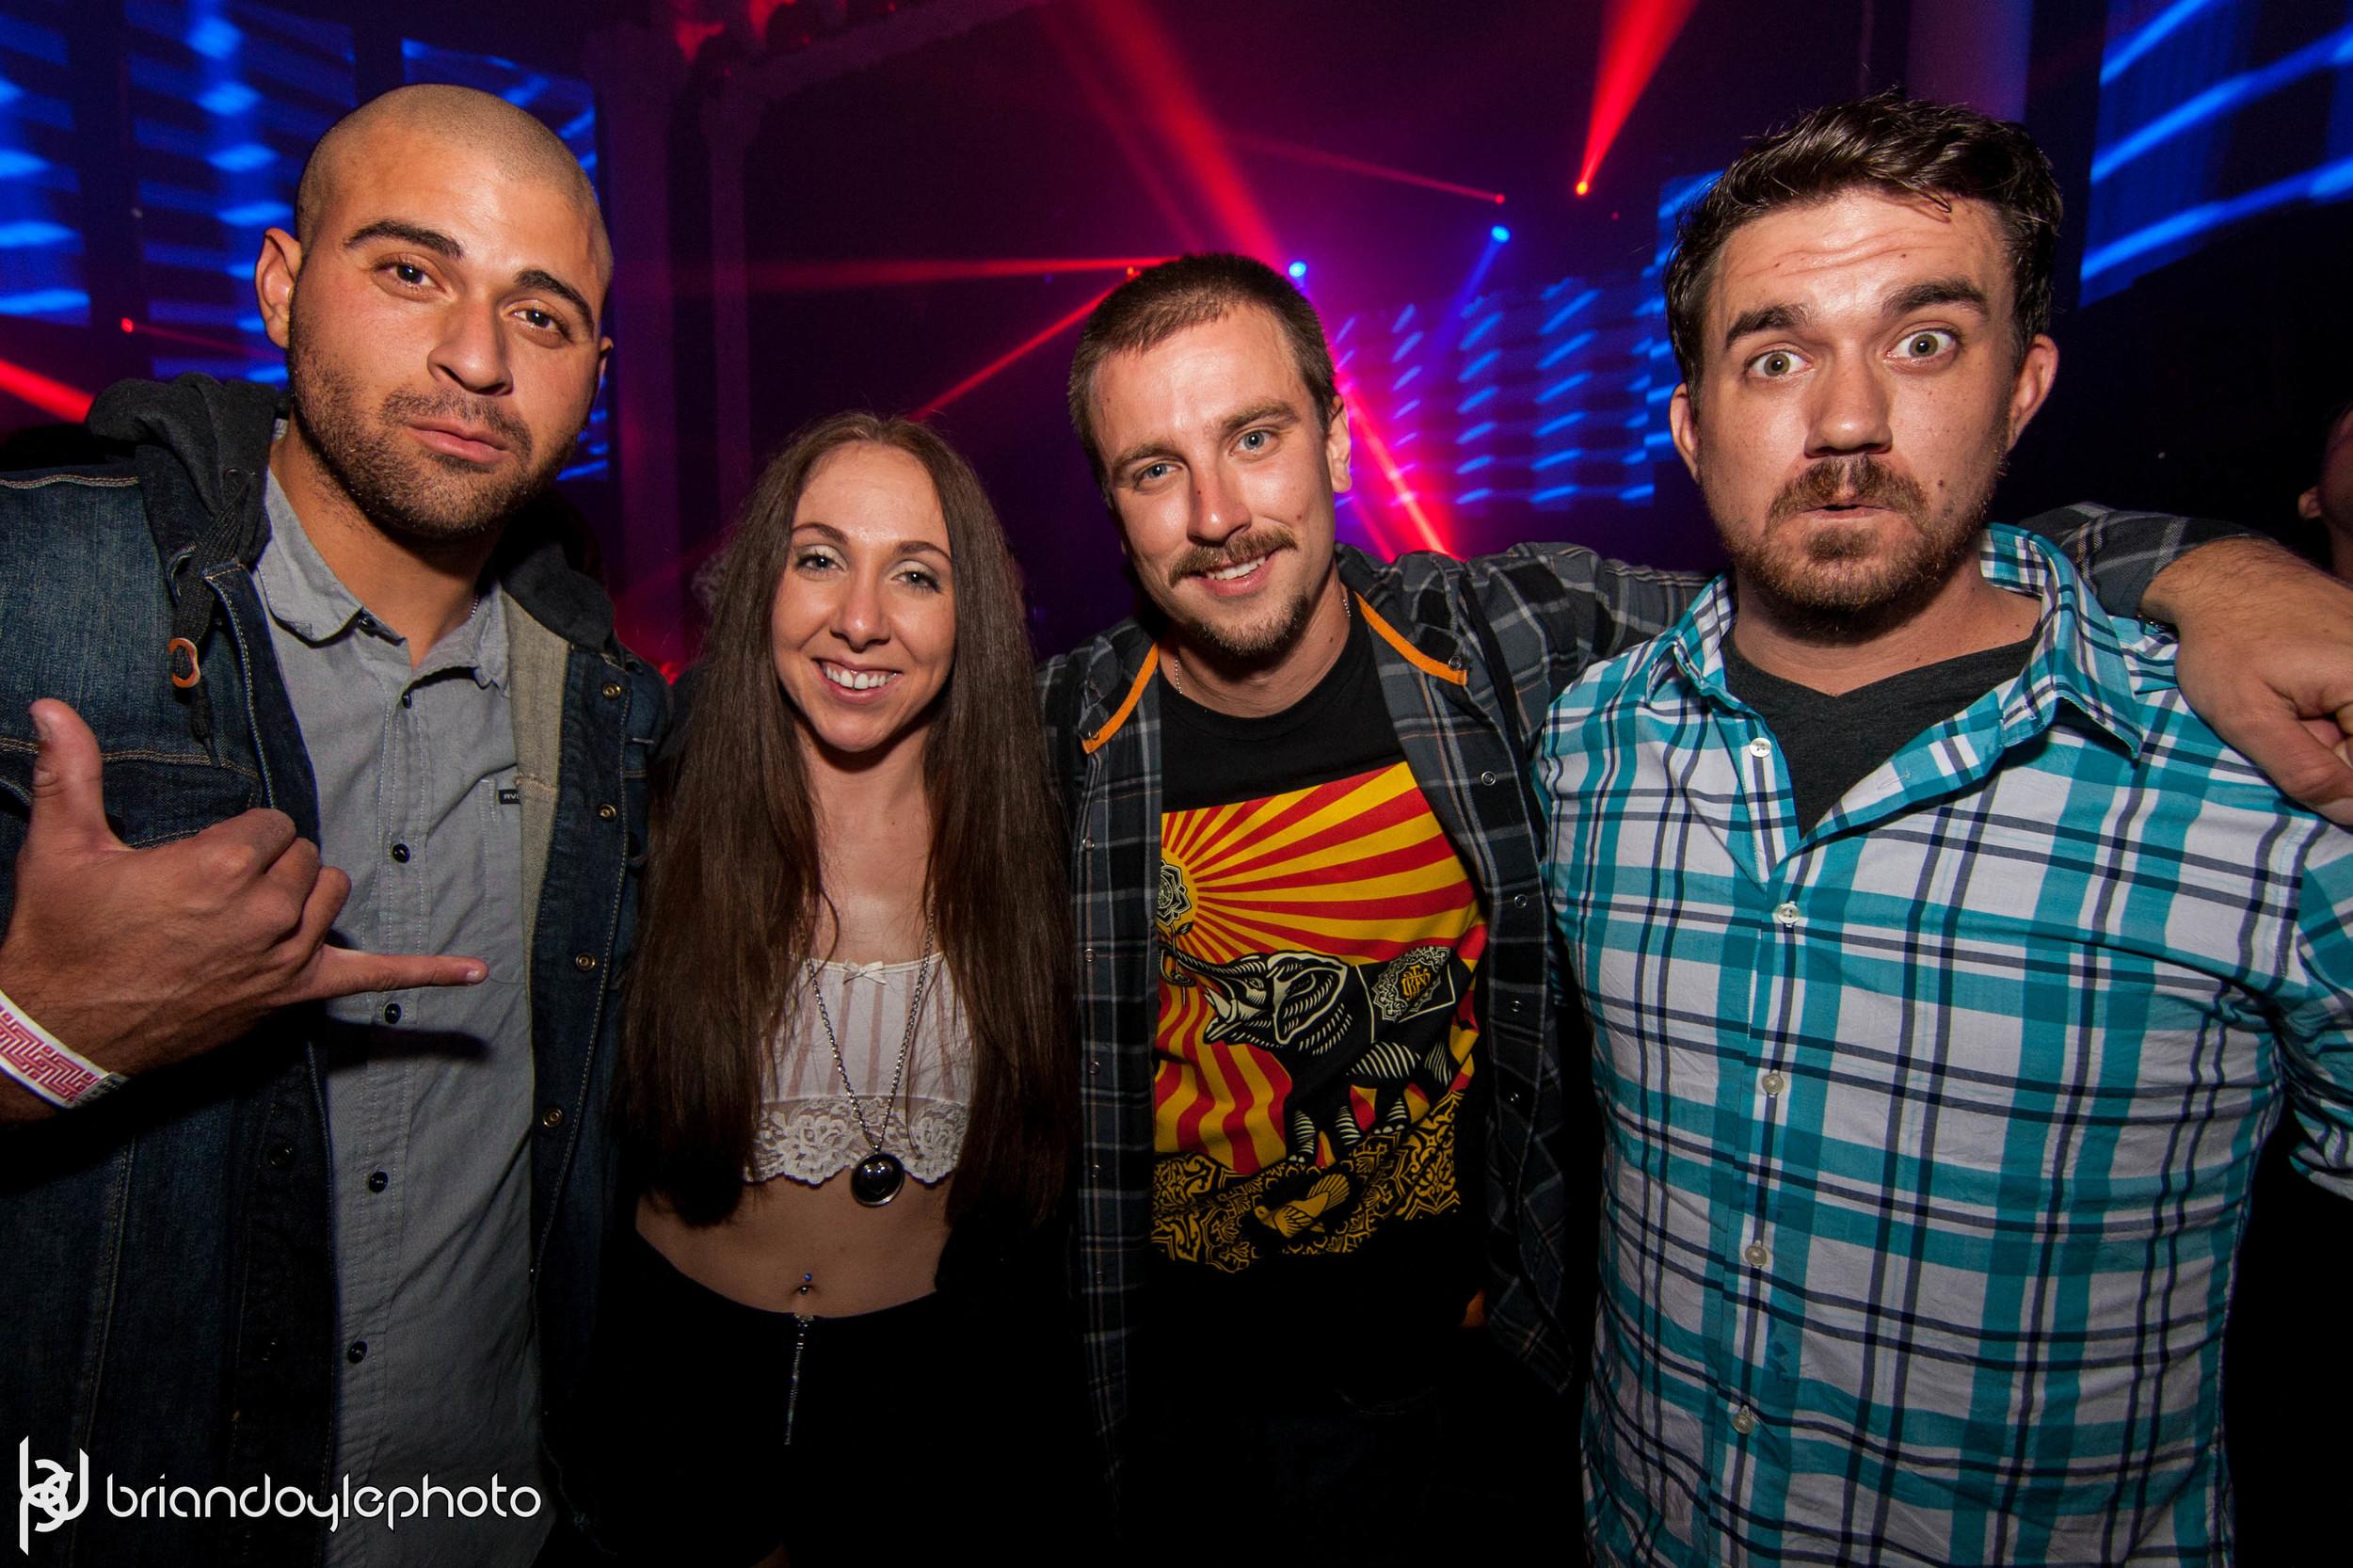 Bro Safari - Black Out Tour @ Avalon bdp 26.09.14-21.jpg